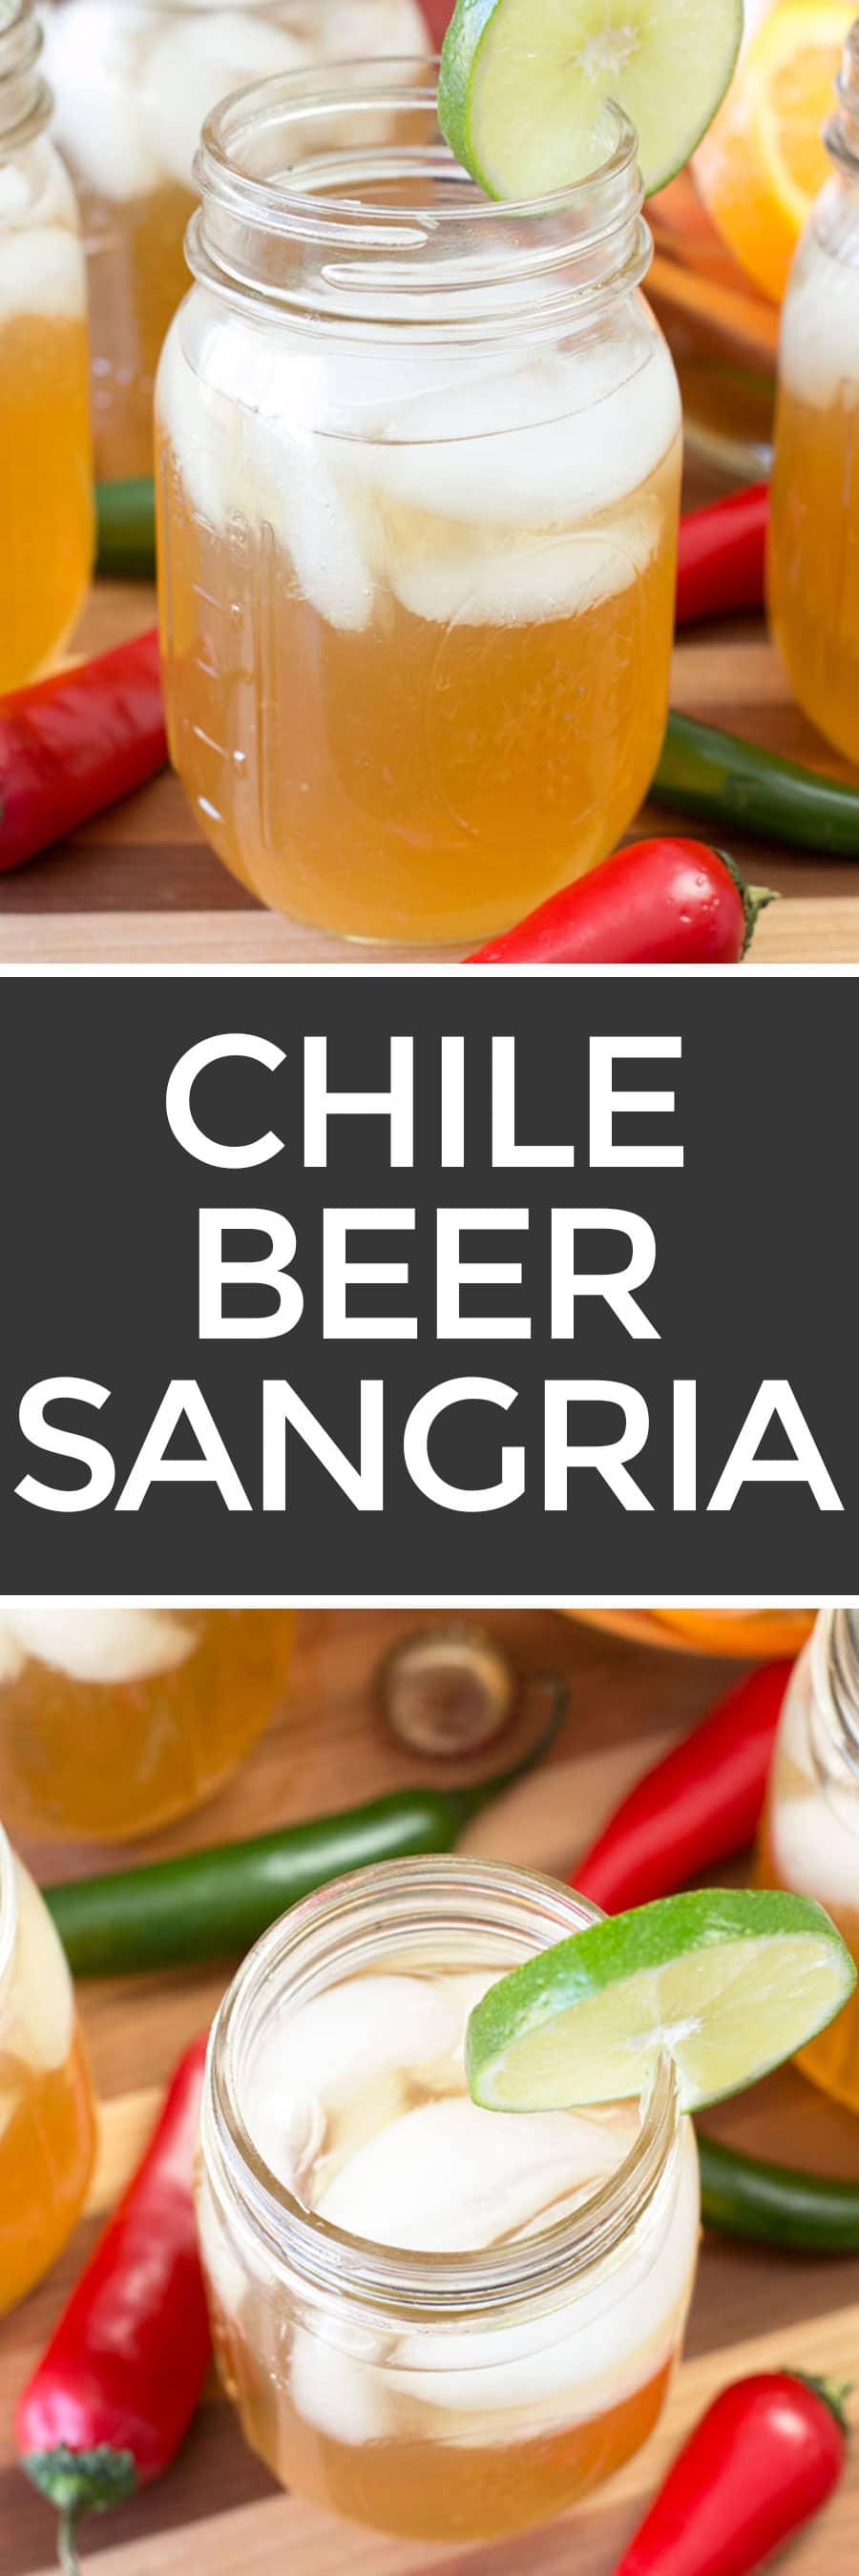 Chile Beer Sangria | cakenknife.com